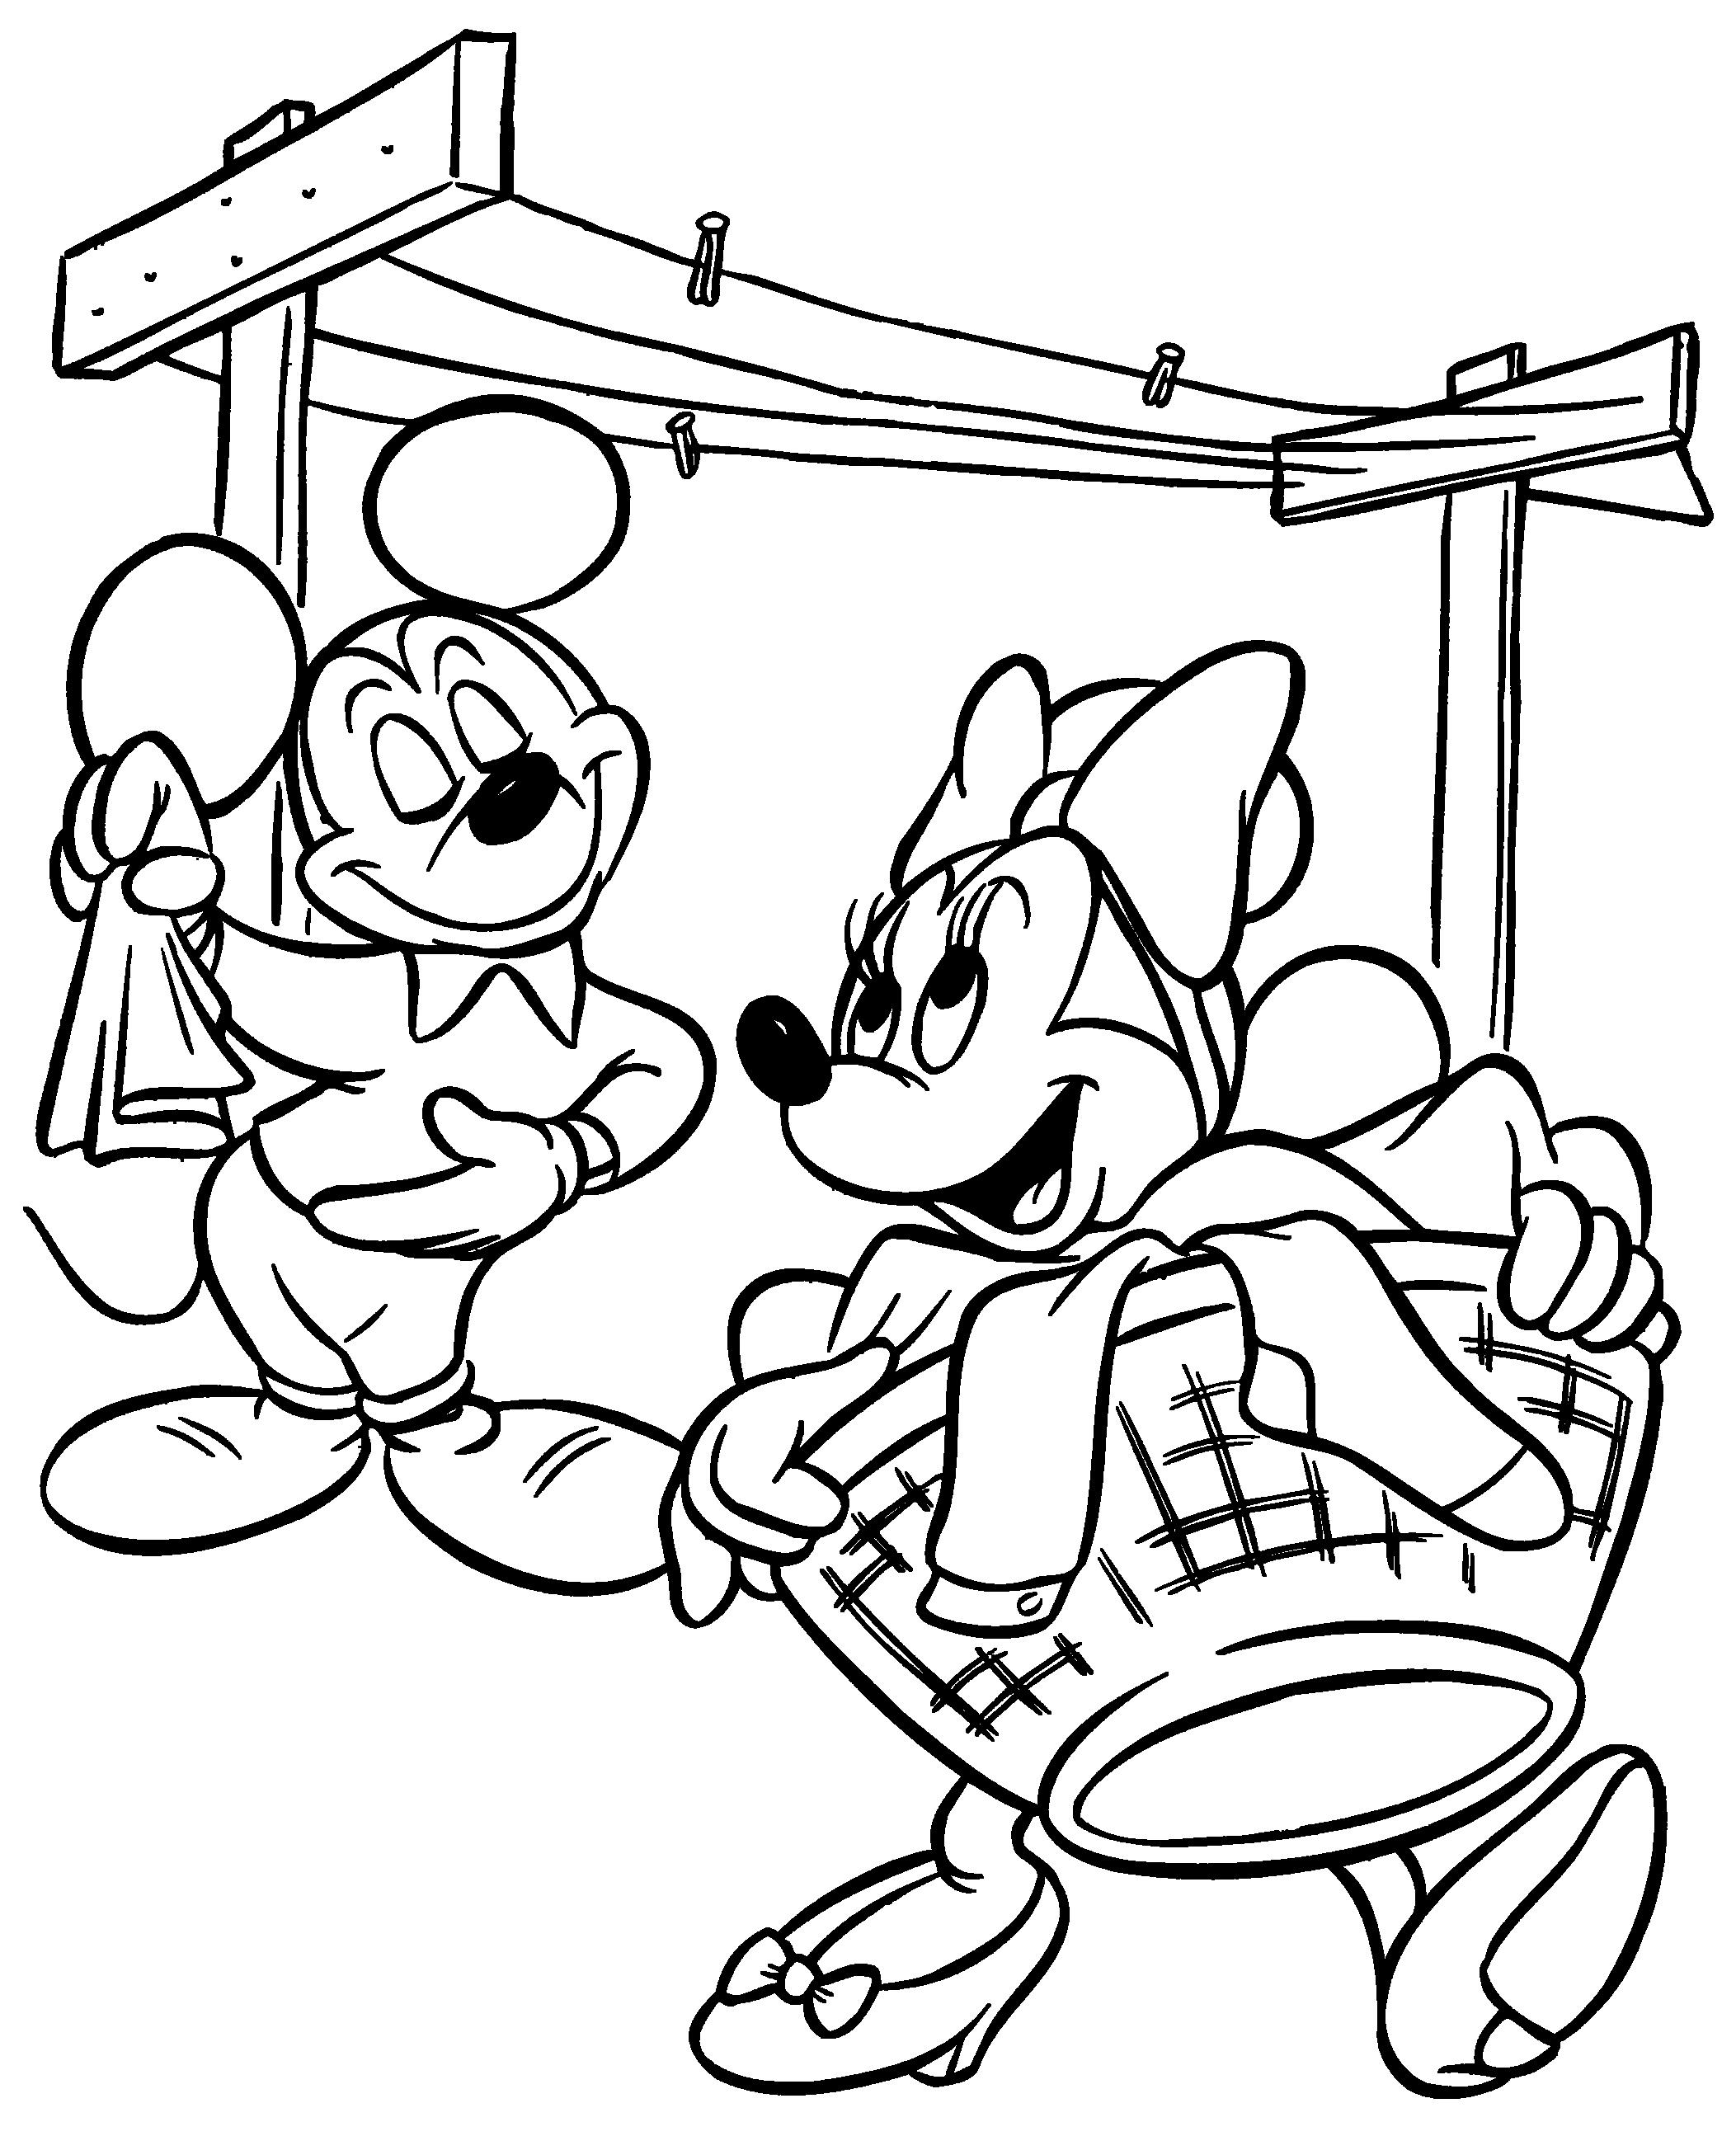 Free Printable Cartoon Images, Download Free Clip Art ...